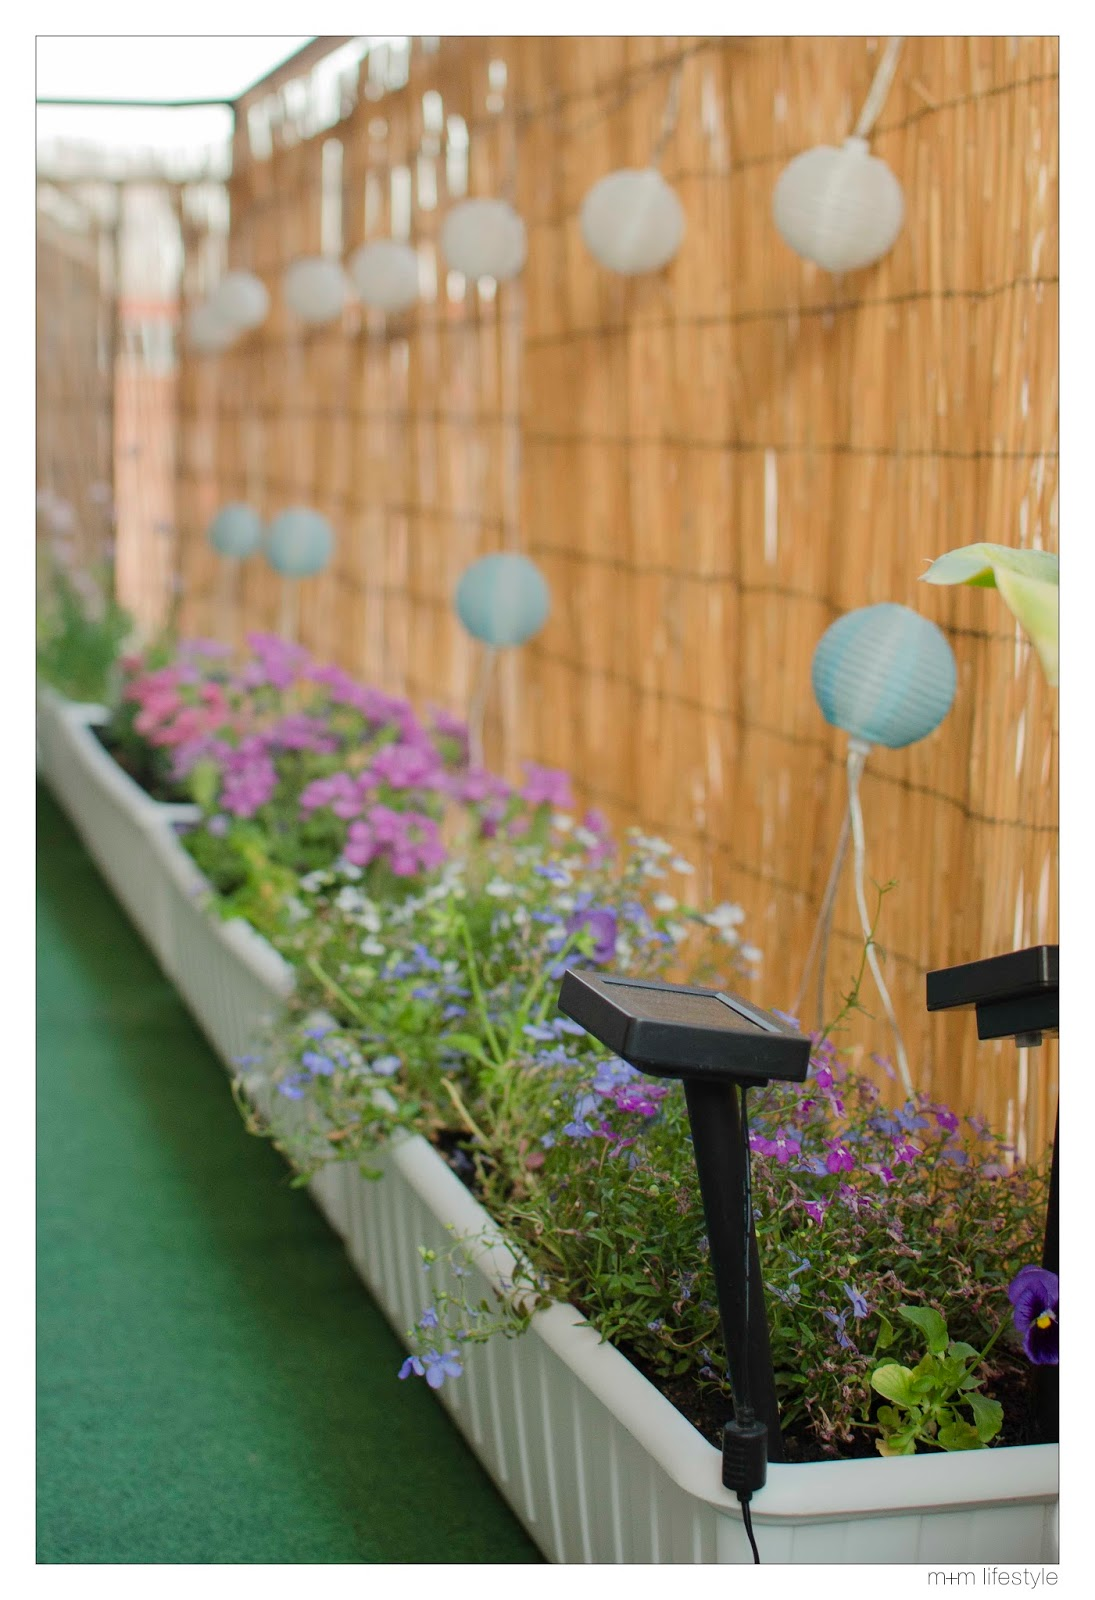 M m lifestyle ideas para decorar el balc n - Maceteros colgantes ikea ...